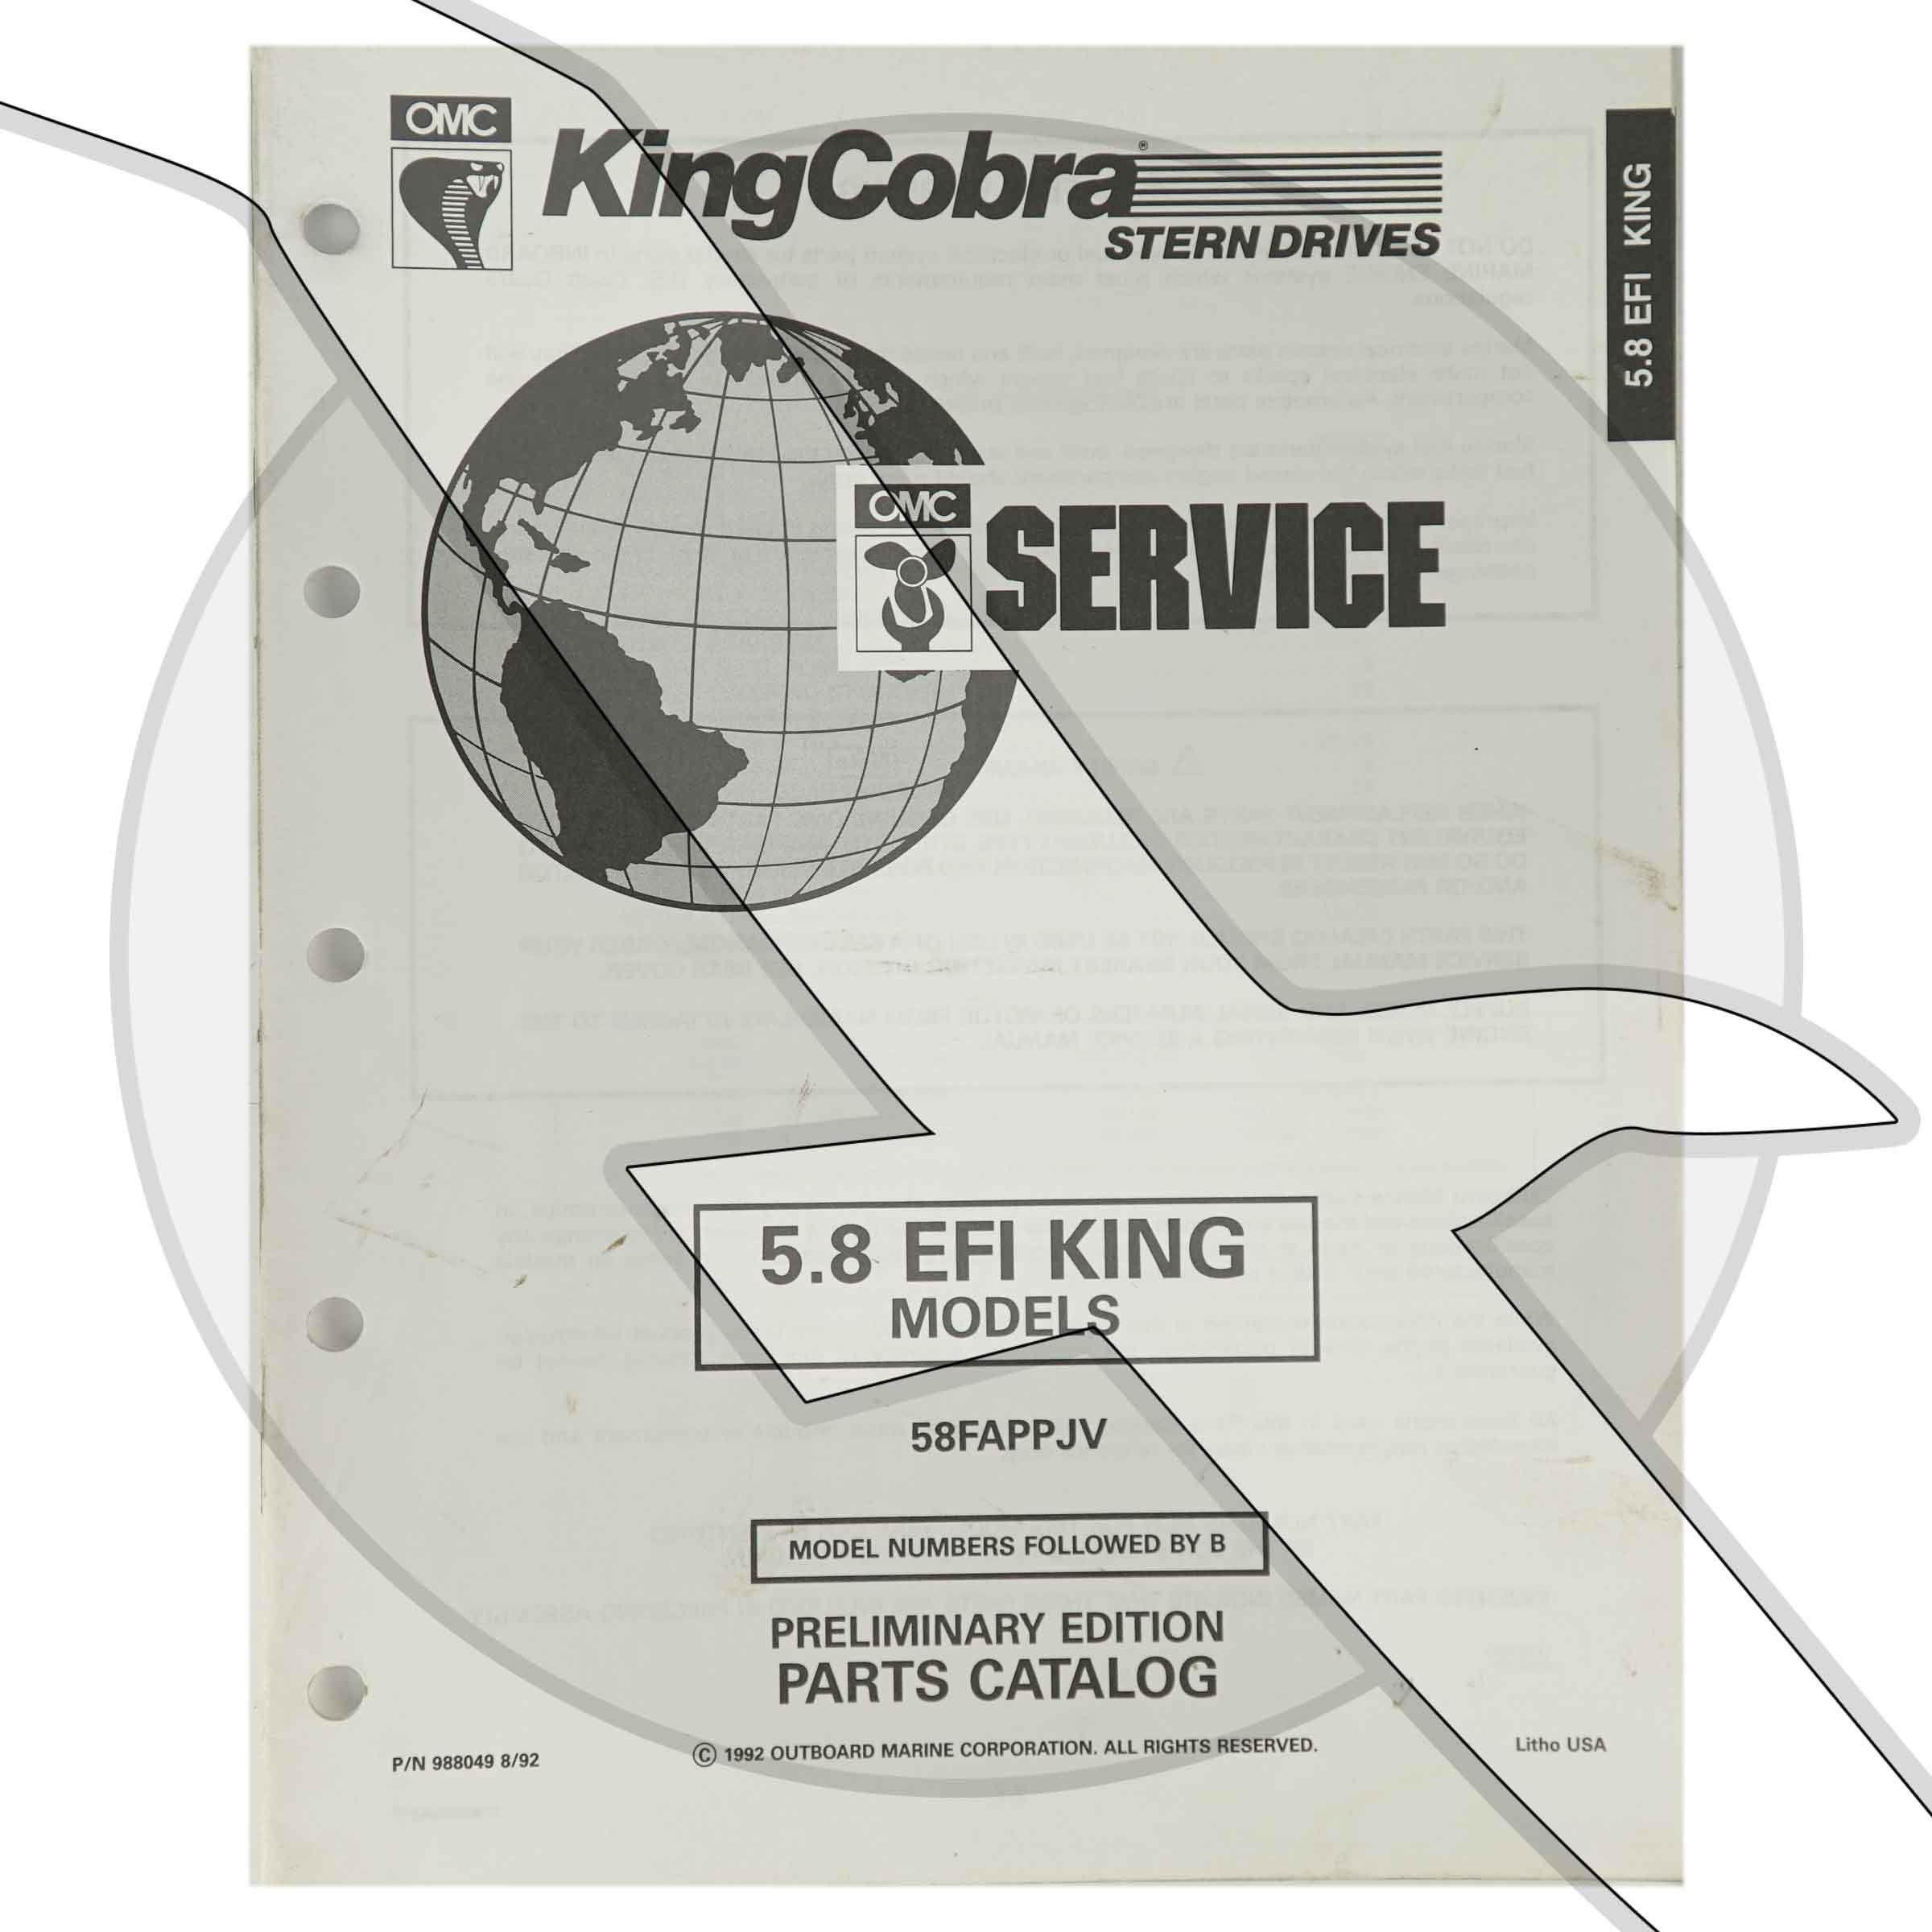 Details about 1993 OMC King Cobra 5 8L 351 EFI Engine & Sterndrive Parts  Diagram Catalog